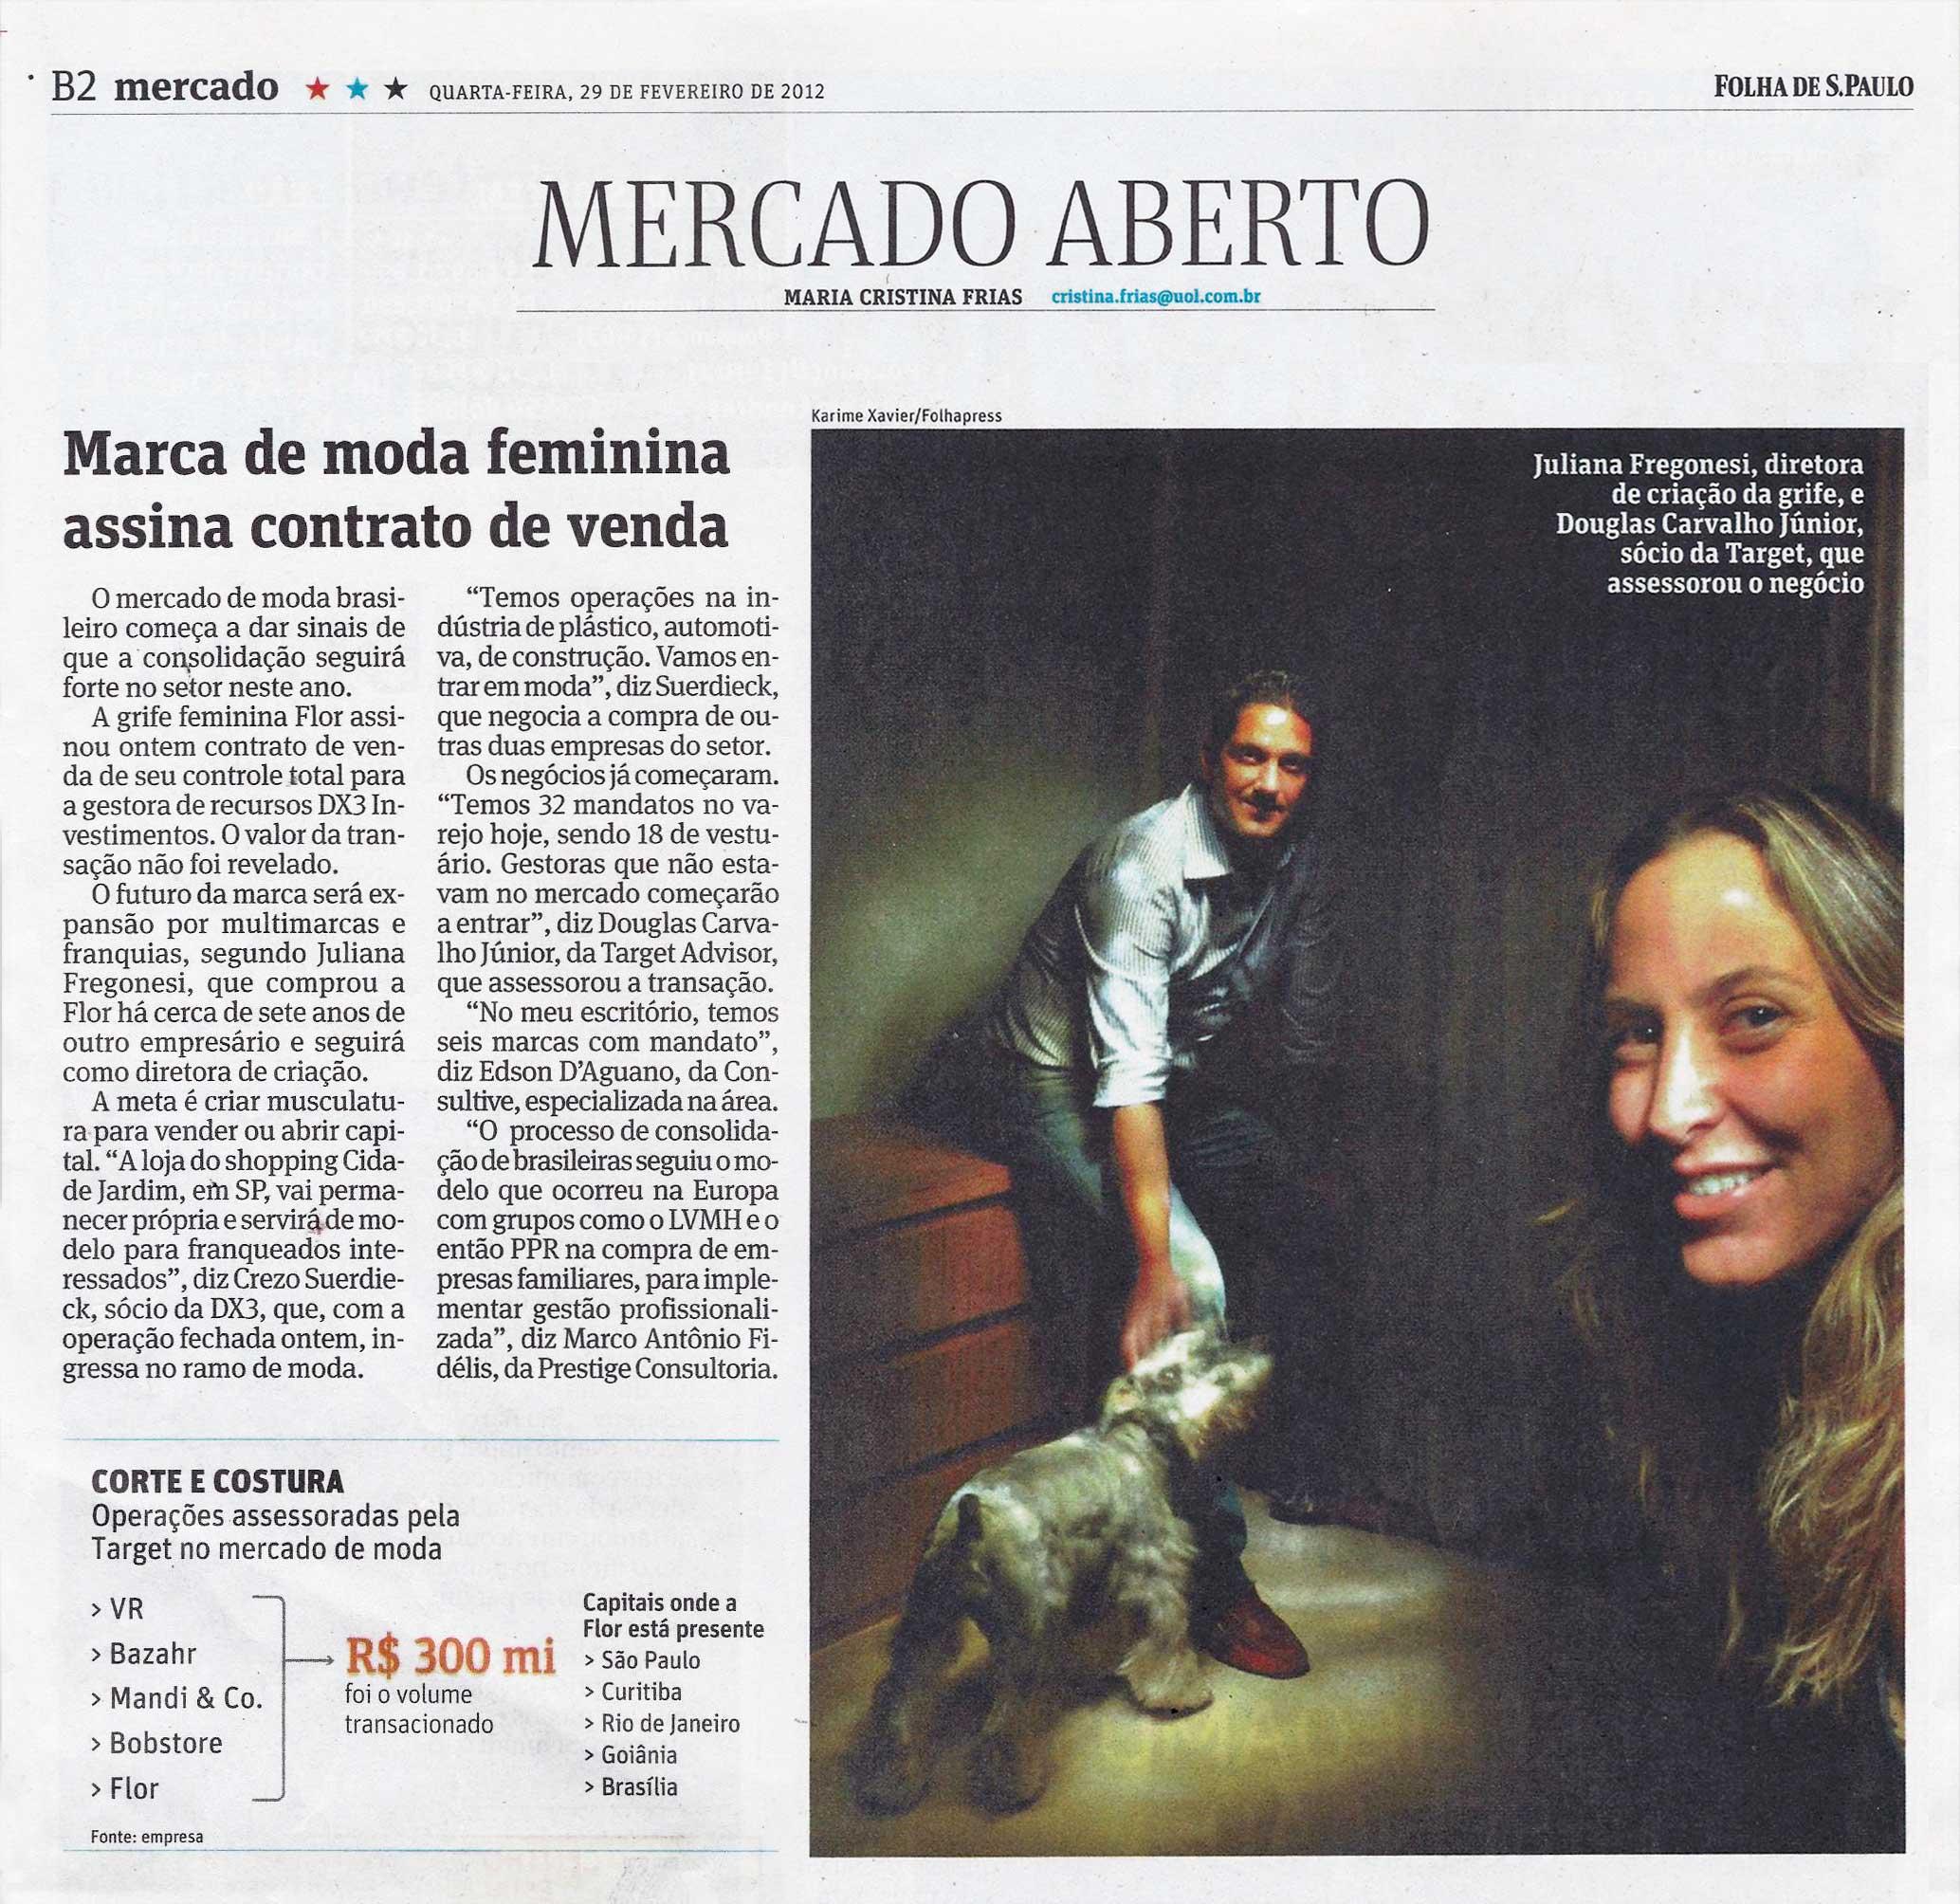 folha-de-sao-paulo-materia-target-advisor-29-02-2012